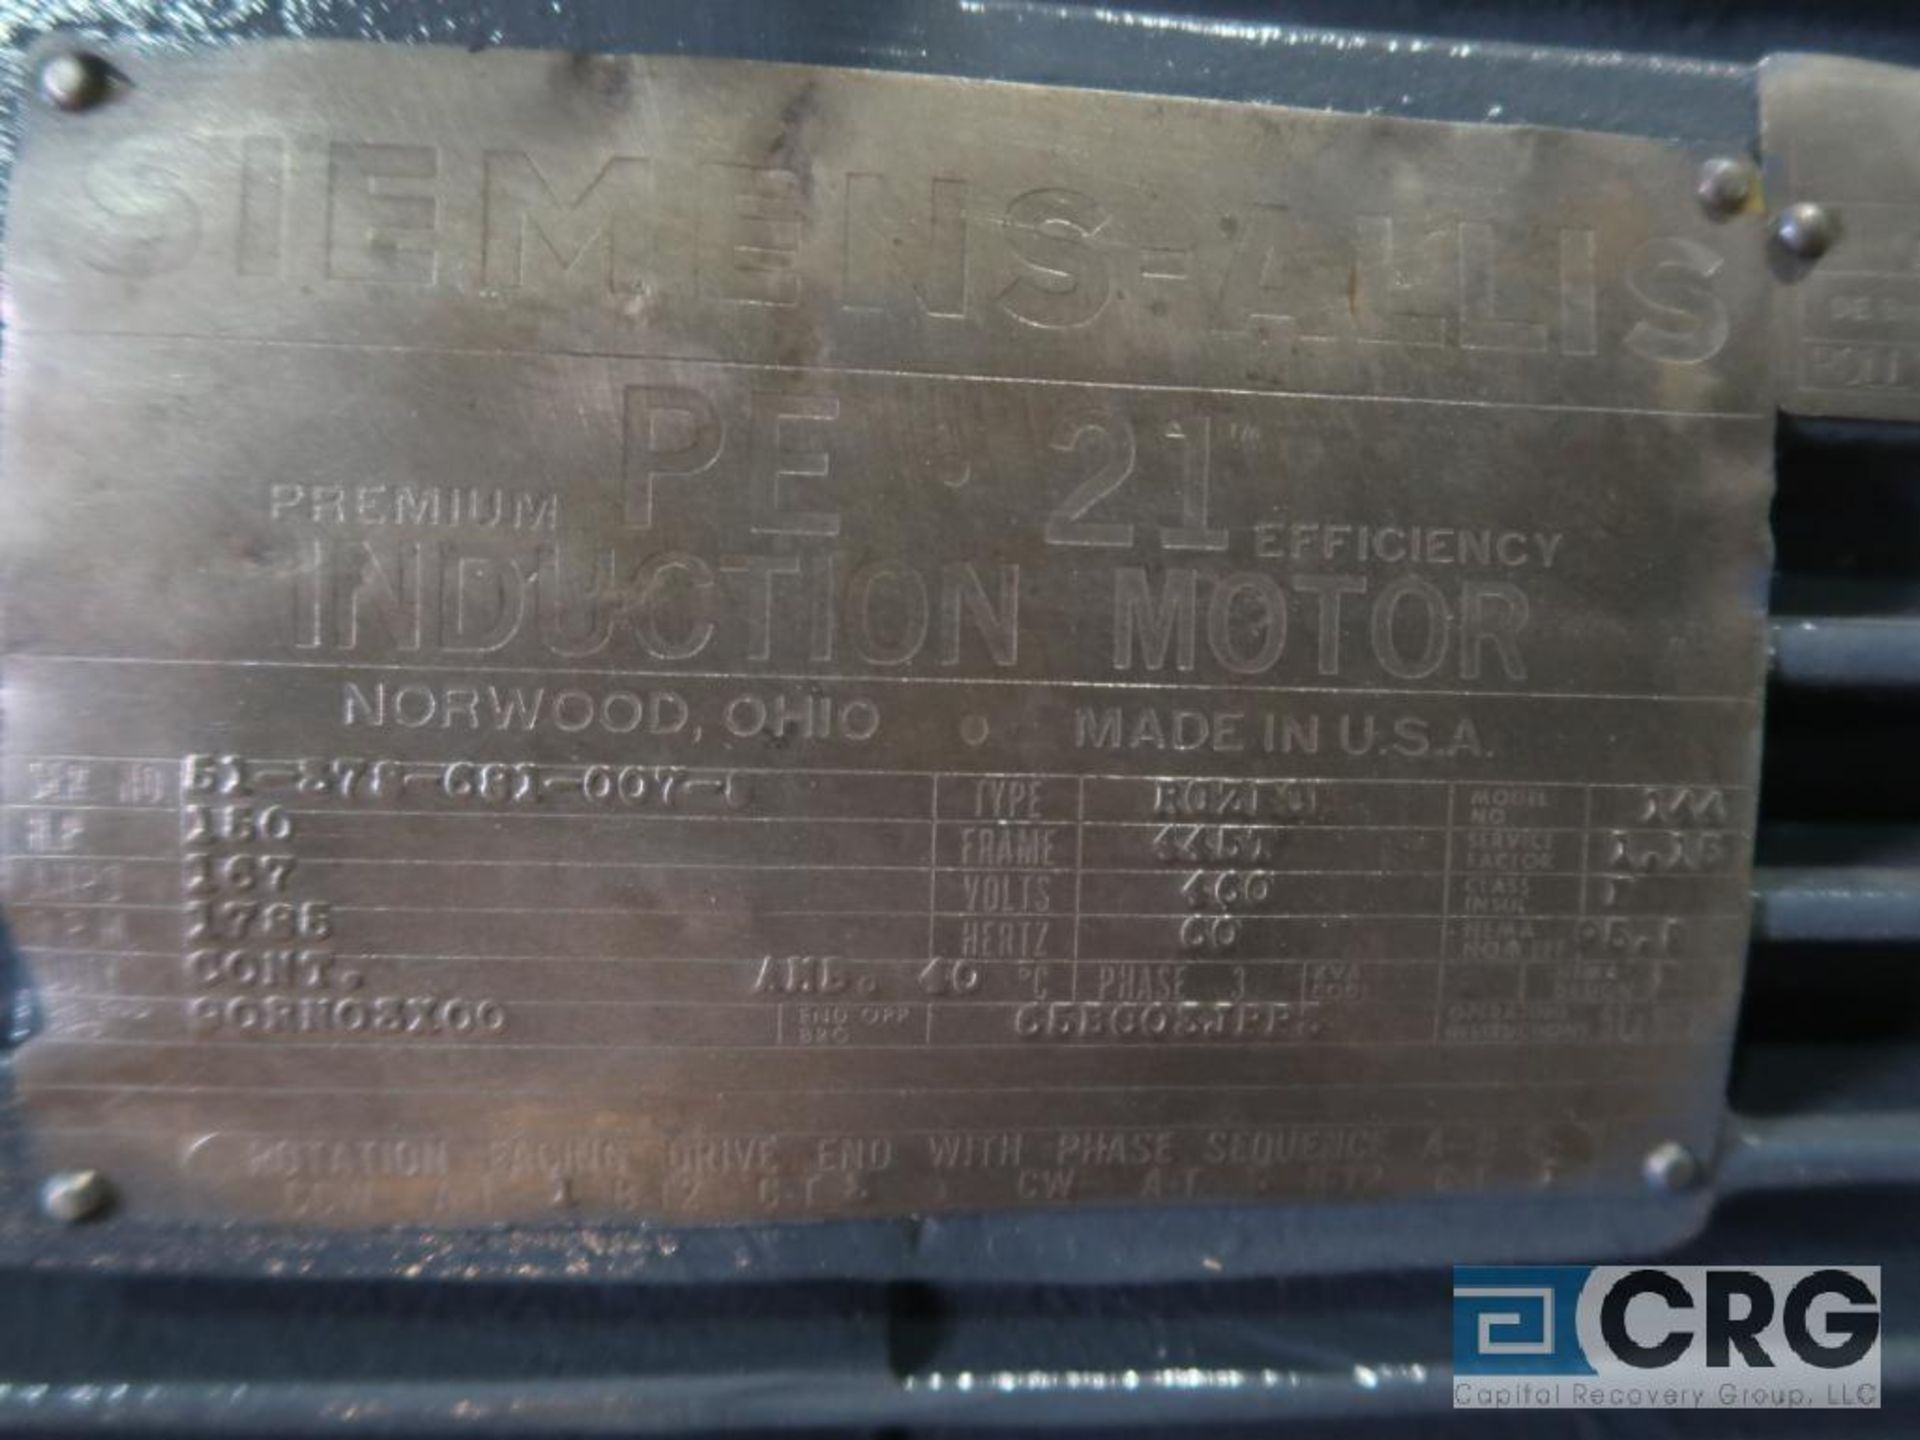 Siemens-Allis PE-21 efficiency motor, 150 HP, 1,785 RPMs, 460 volt, 3 ph., 445T frame (Finish - Image 2 of 2